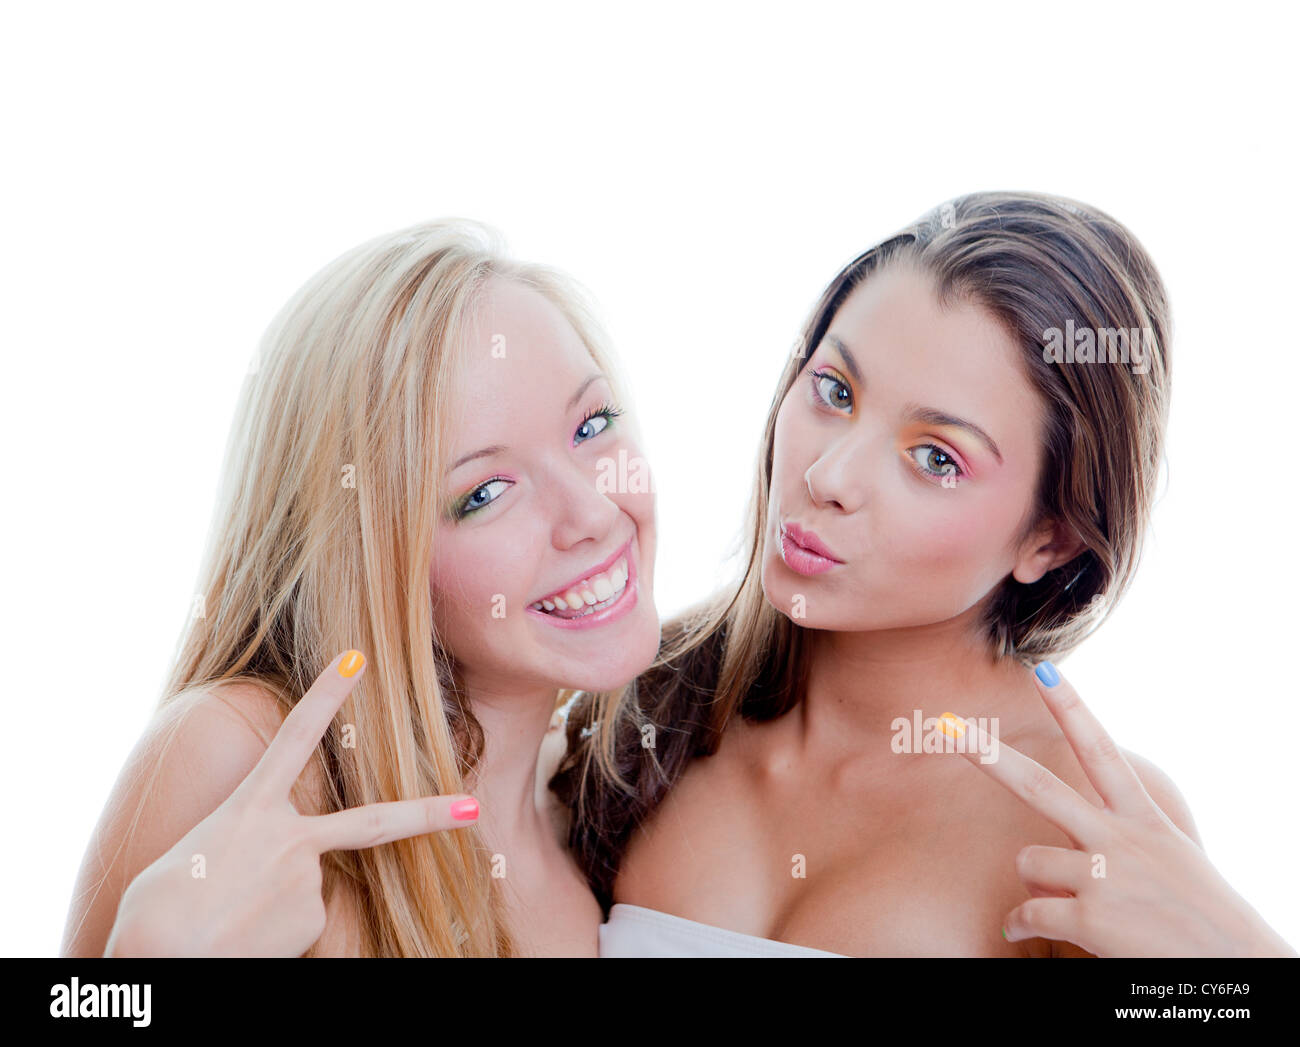 young fashion teens doing v sign - Stock Image